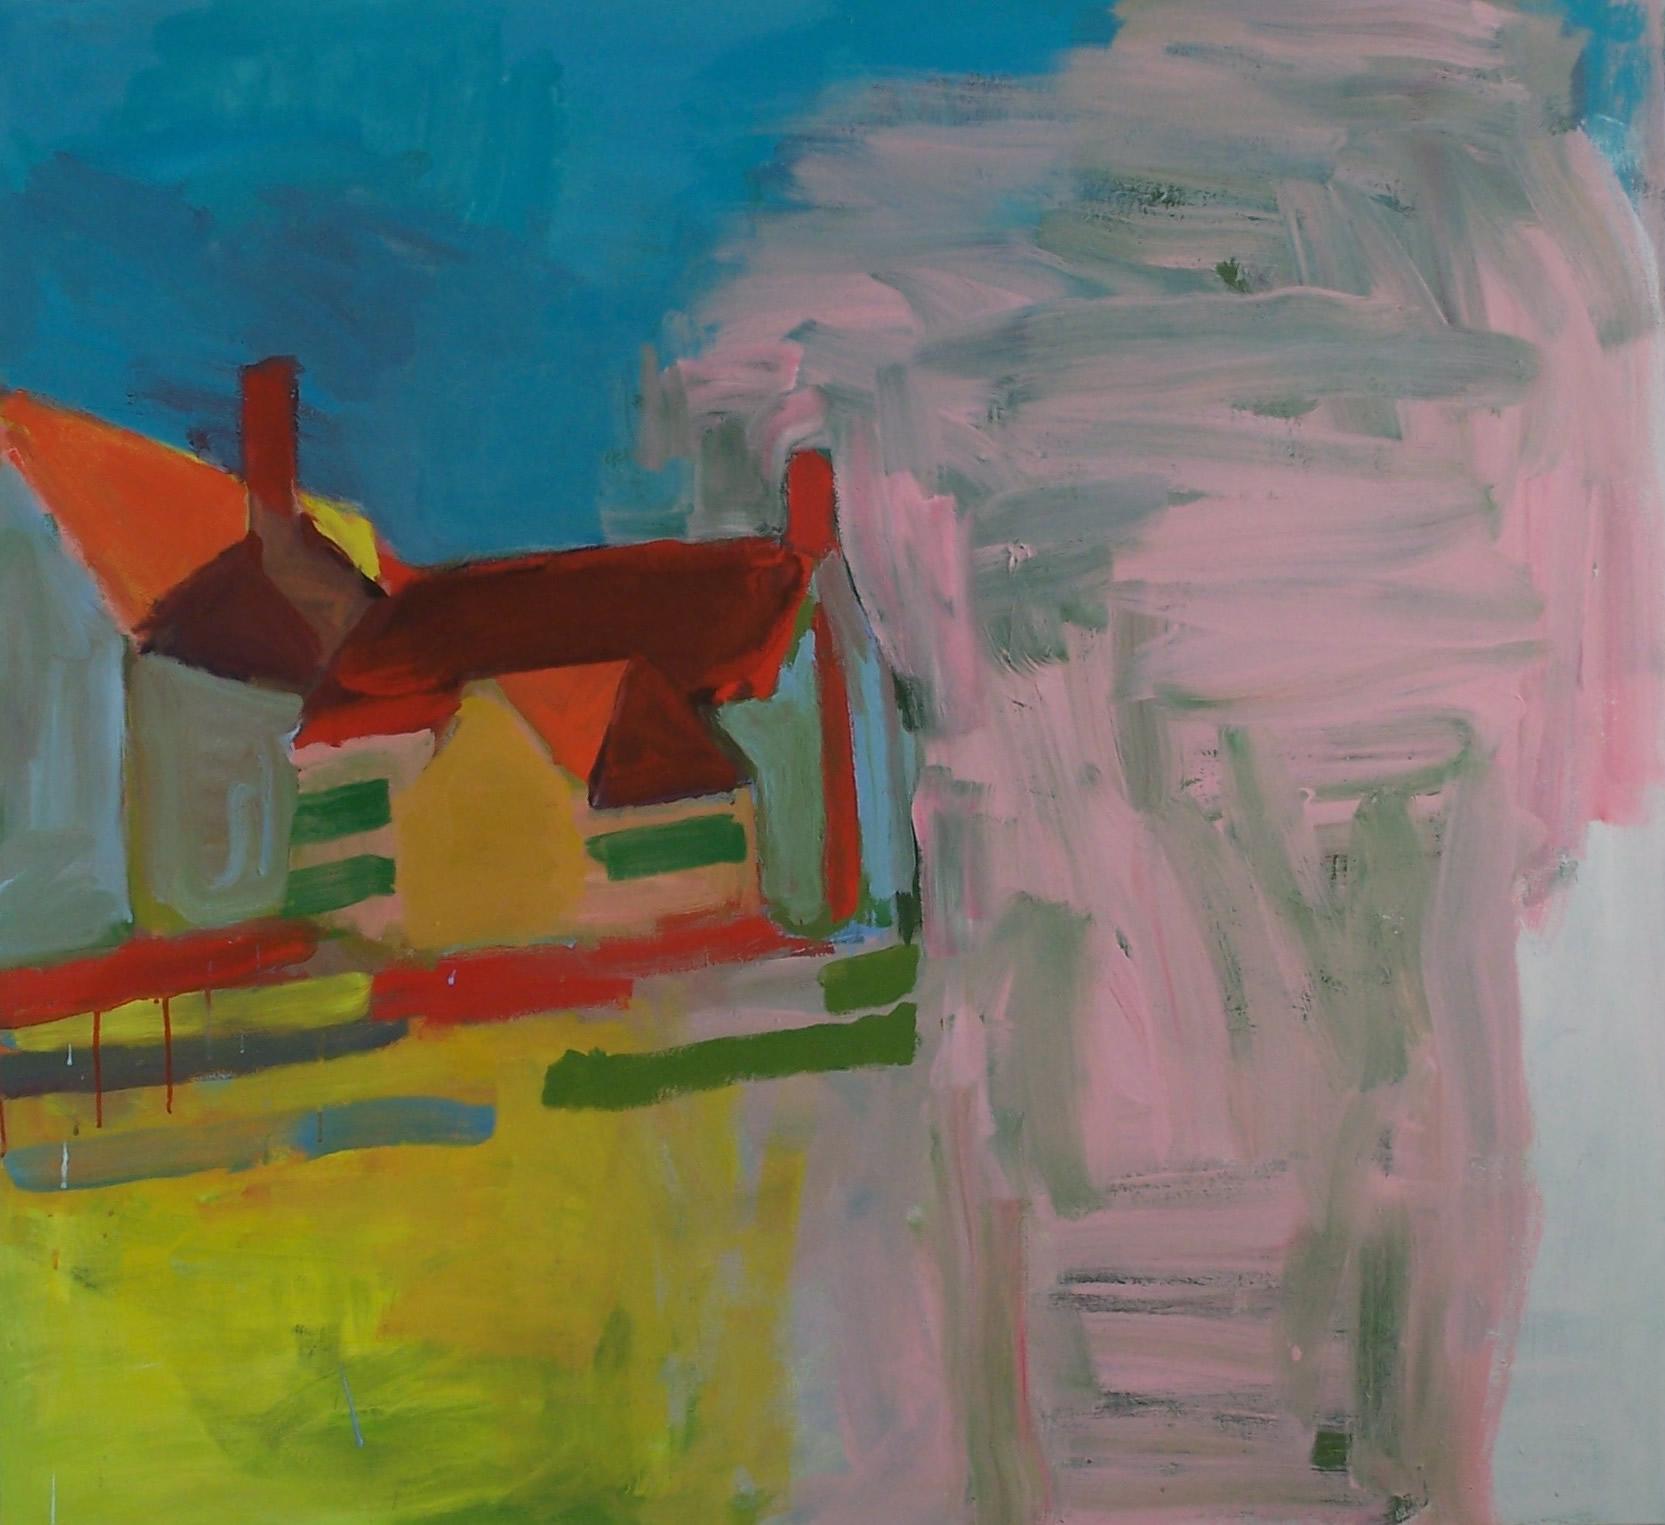 Willy Lott's House, Summer, 2007